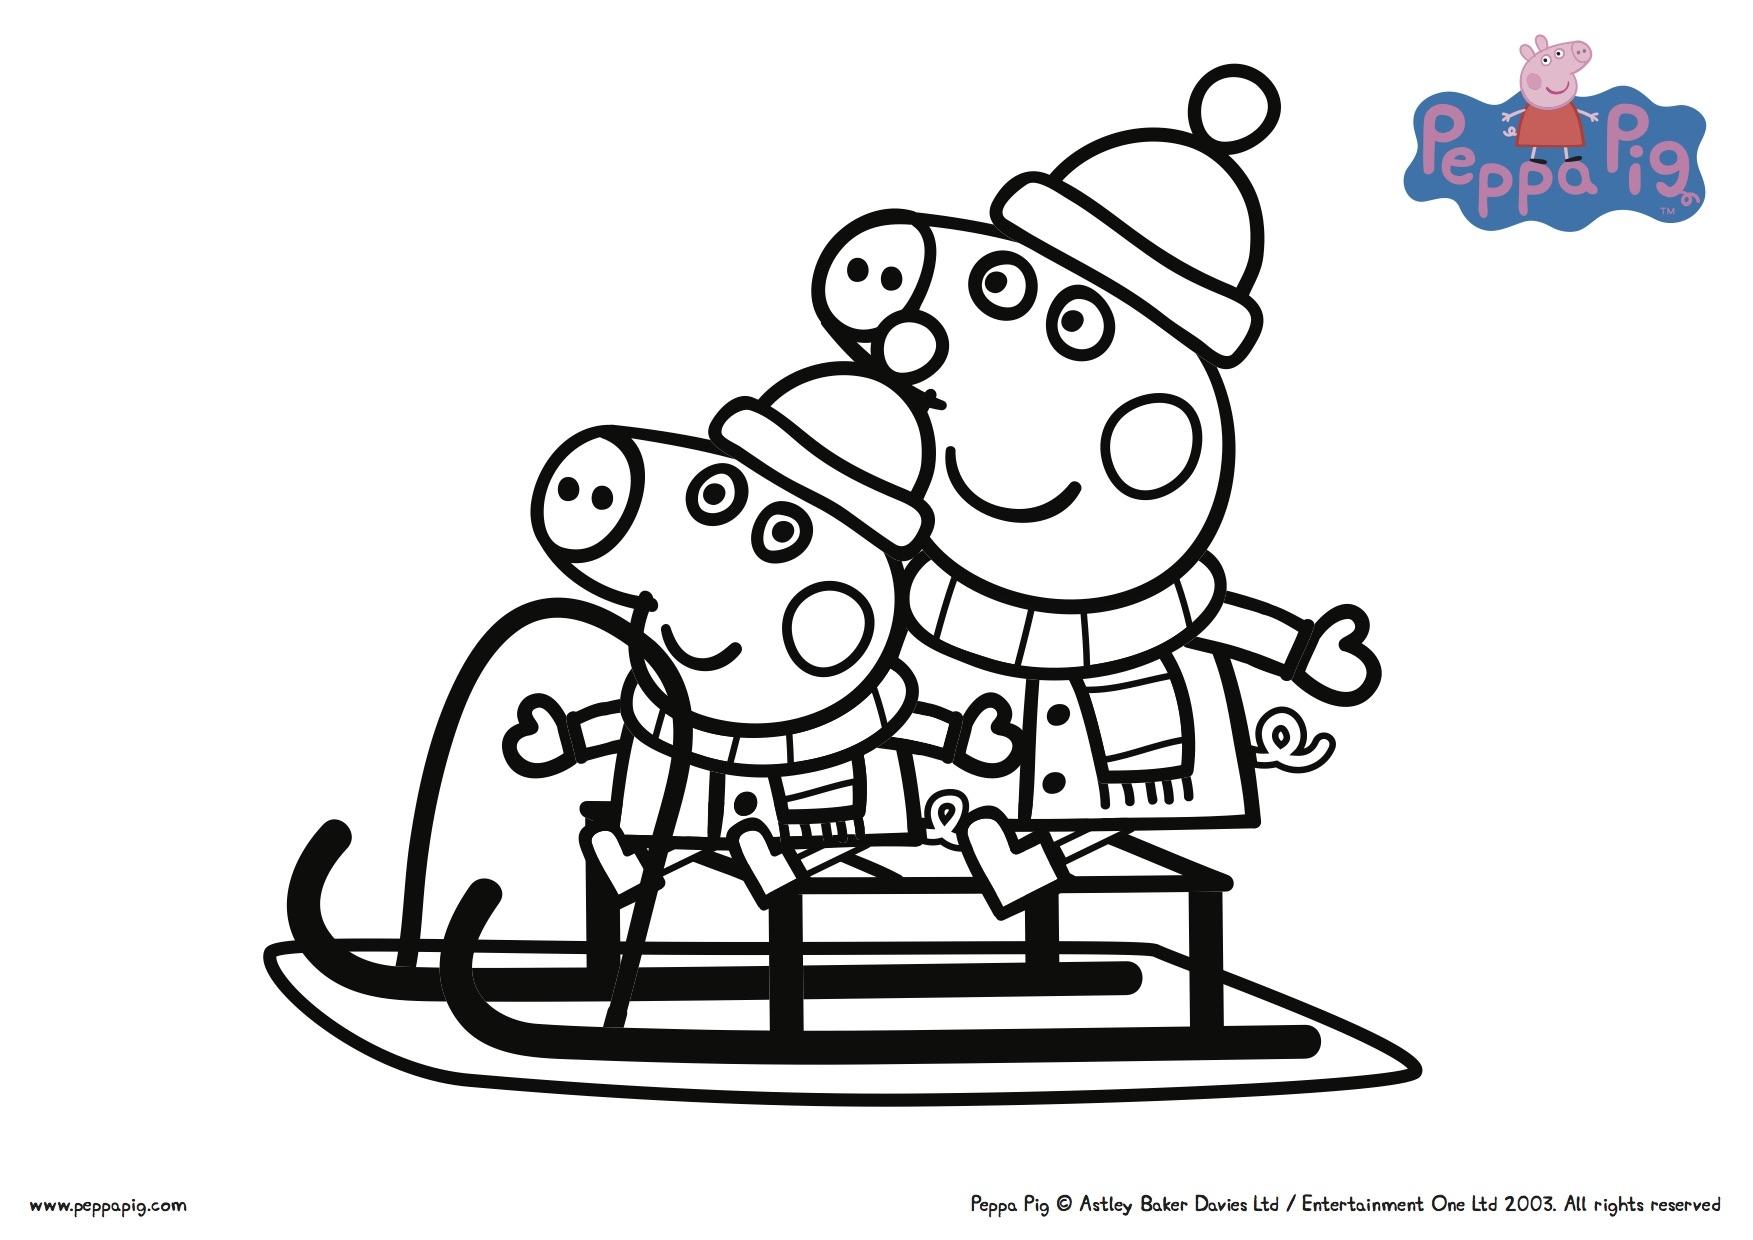 Peppa Pig Christmas Sledding Coloring Pages